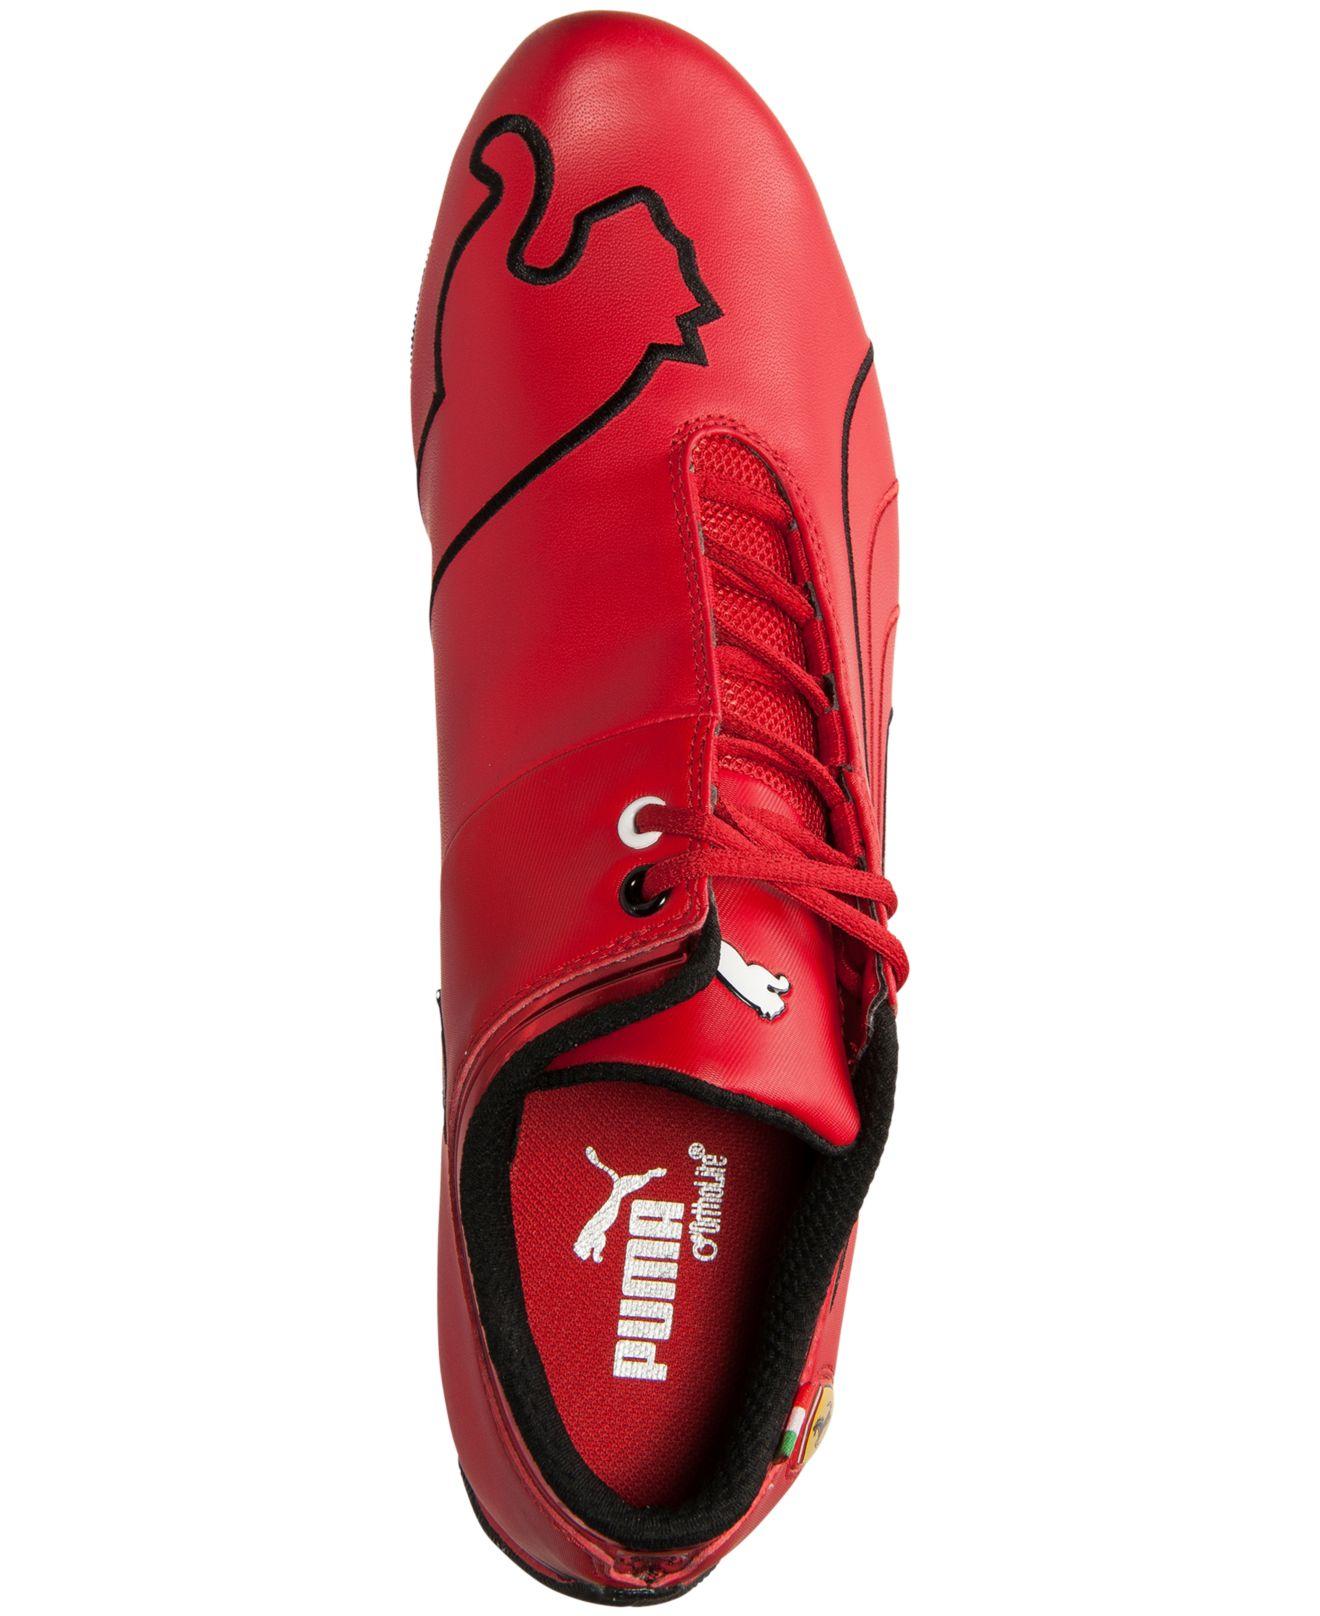 b4678ee28b5abb Lyst - PUMA Men s Future Cat M1 Sf Ferrari Casual Sneakers From Finish Line  in Red for Men